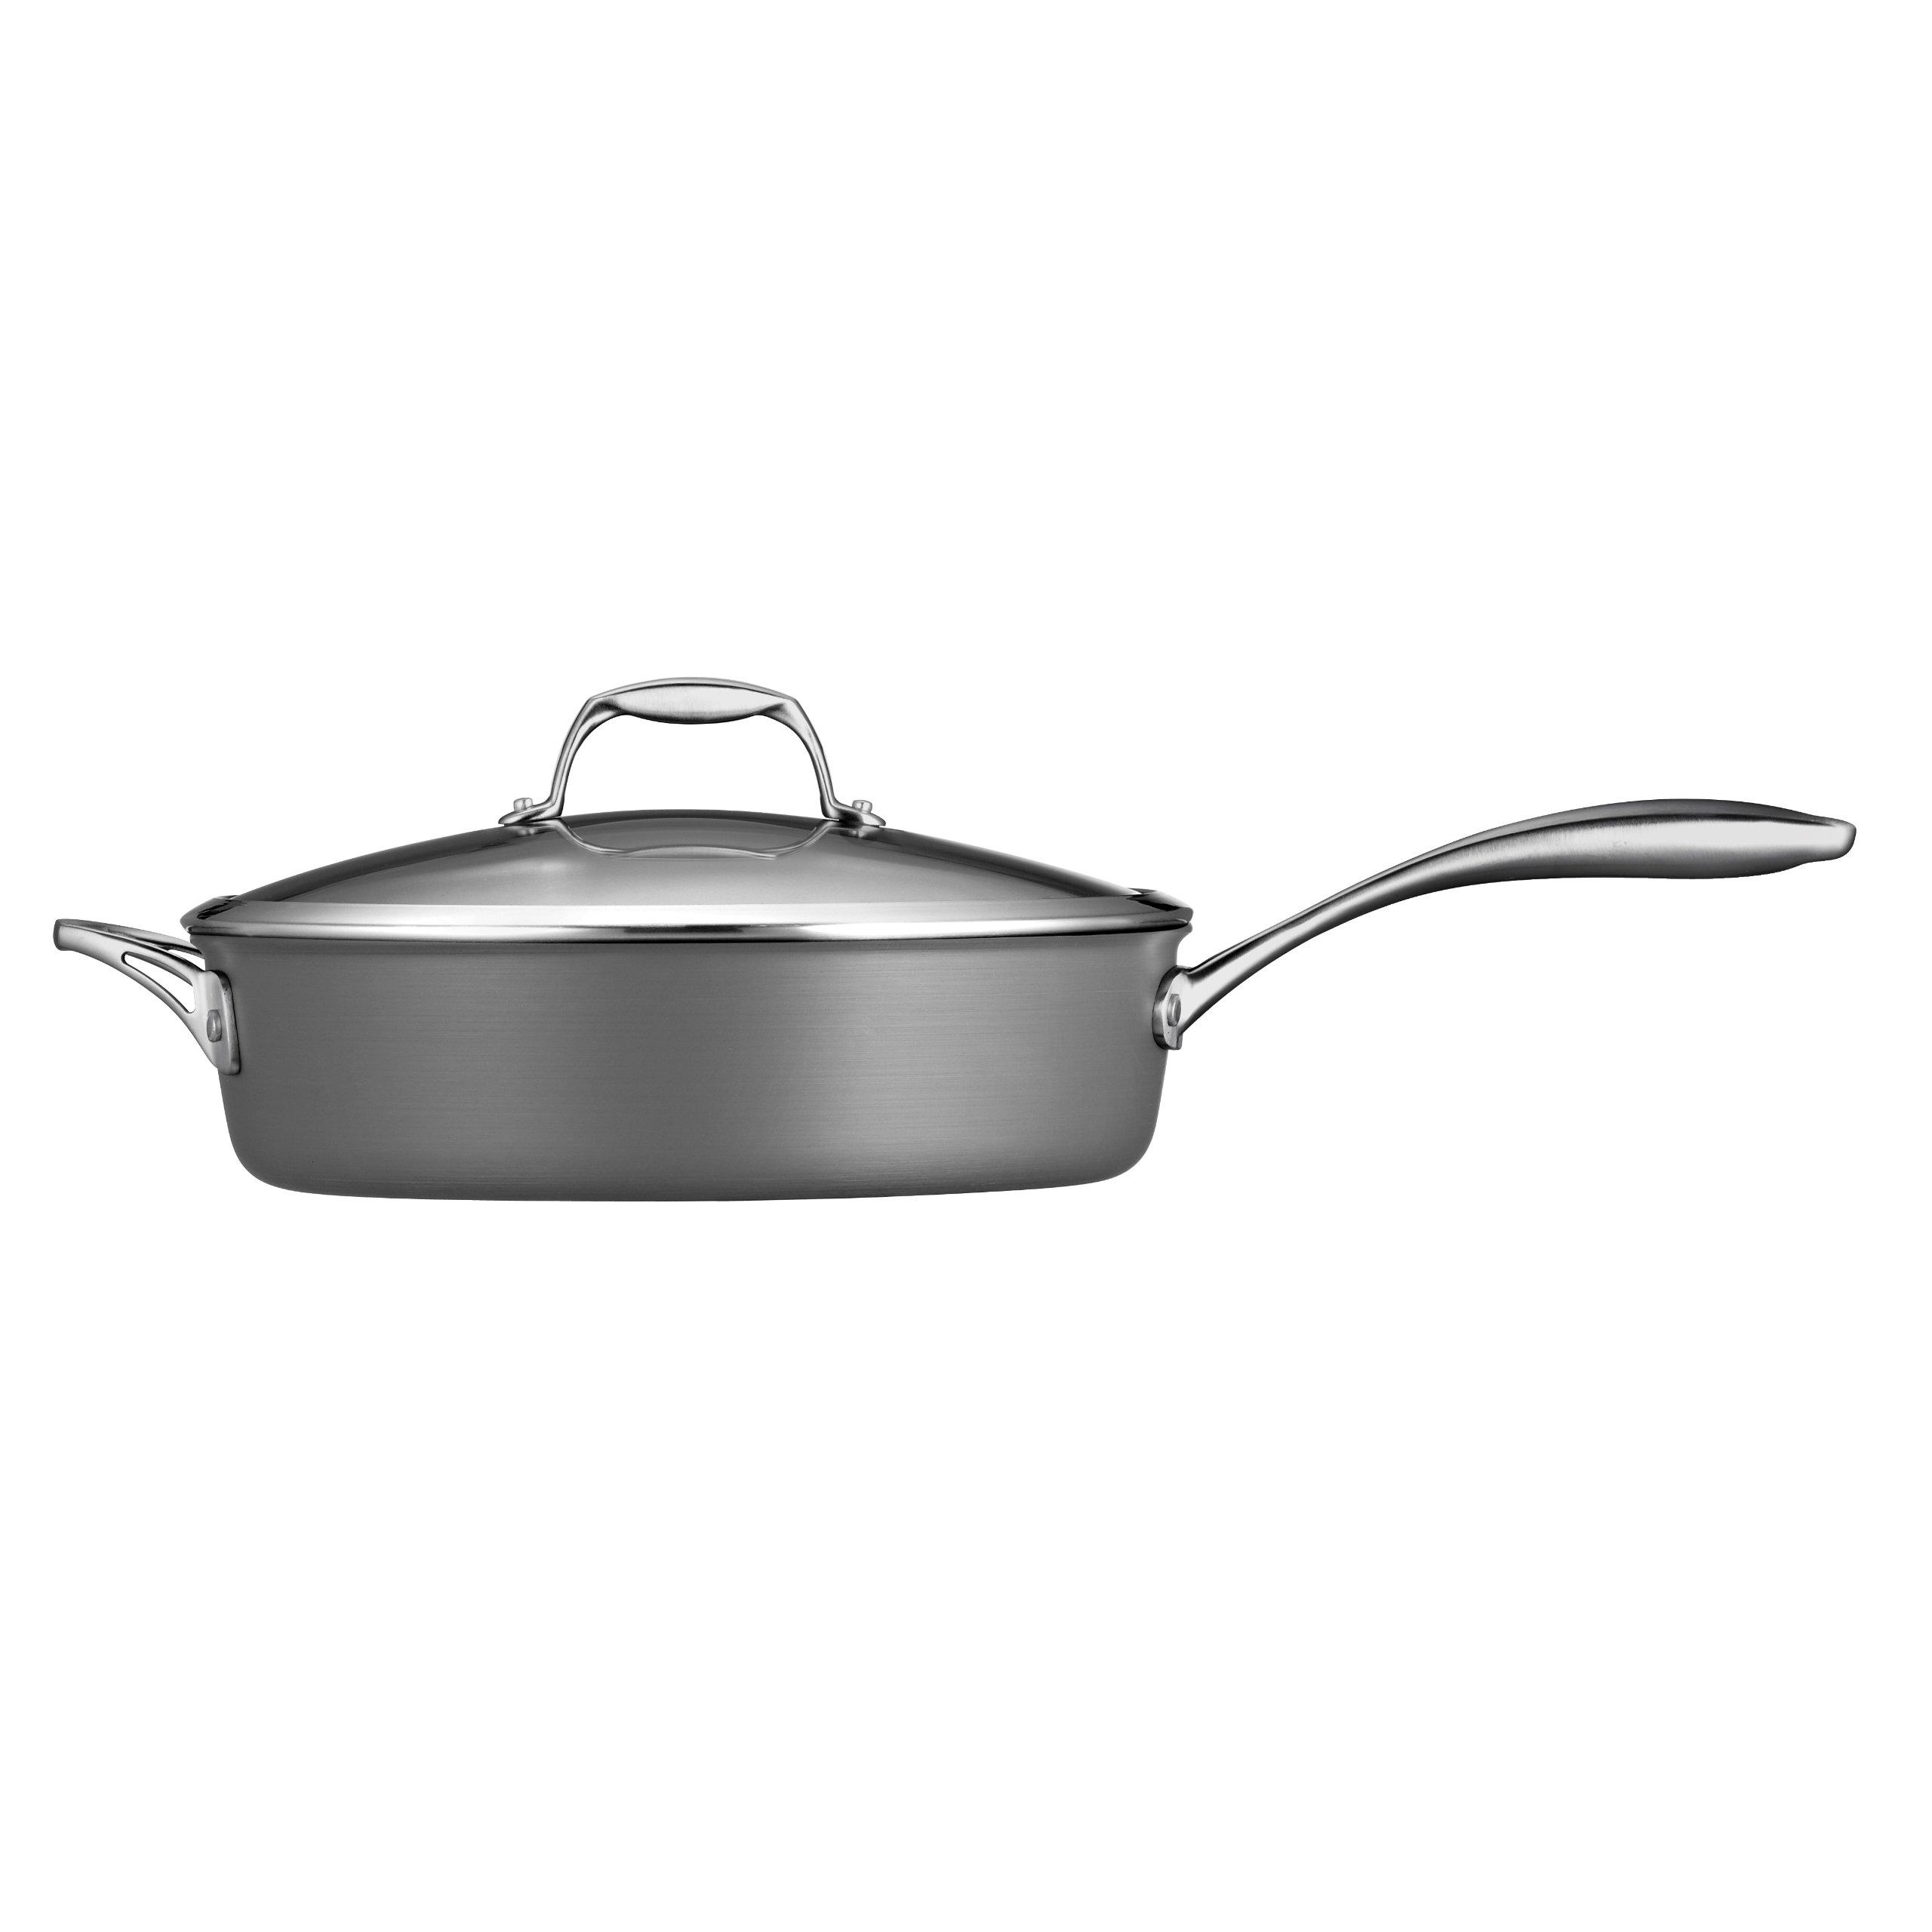 Tramontina 80123/009DS Gourmet Heavy-Gauge Aluminum Nonstick Covered Deep Saute Pan, 5.5-Quart, Hard Anodized